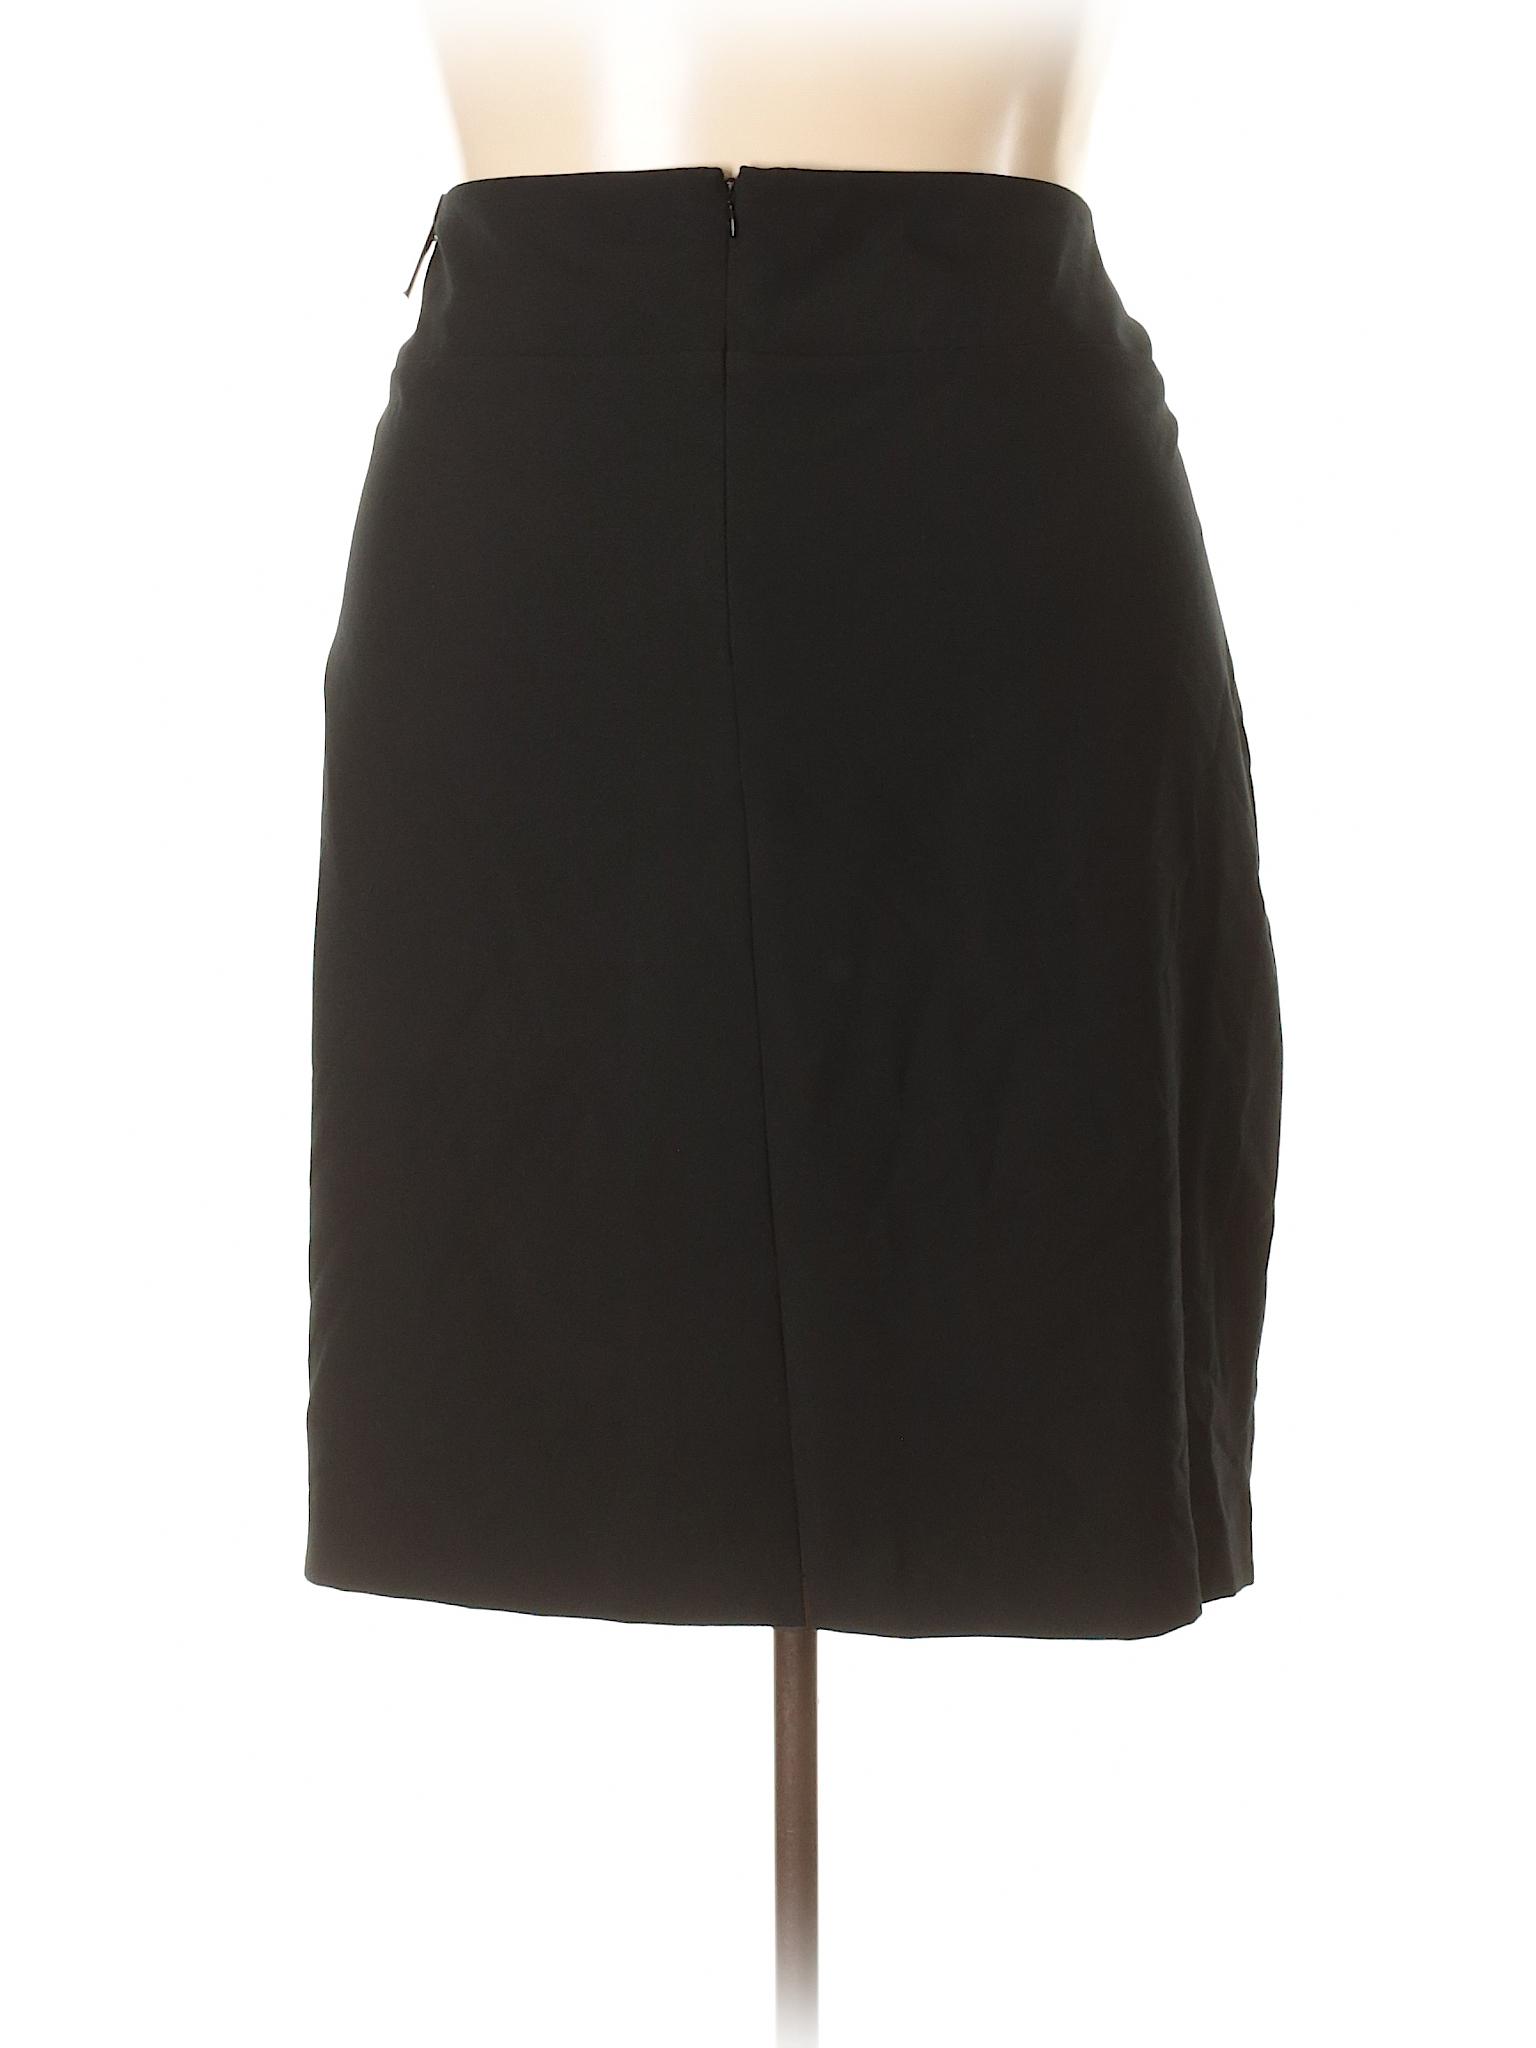 Skirt Boutique Boutique Casual Skirt Alfani Alfani Alfani leisure leisure Casual Boutique leisure rrqpxw